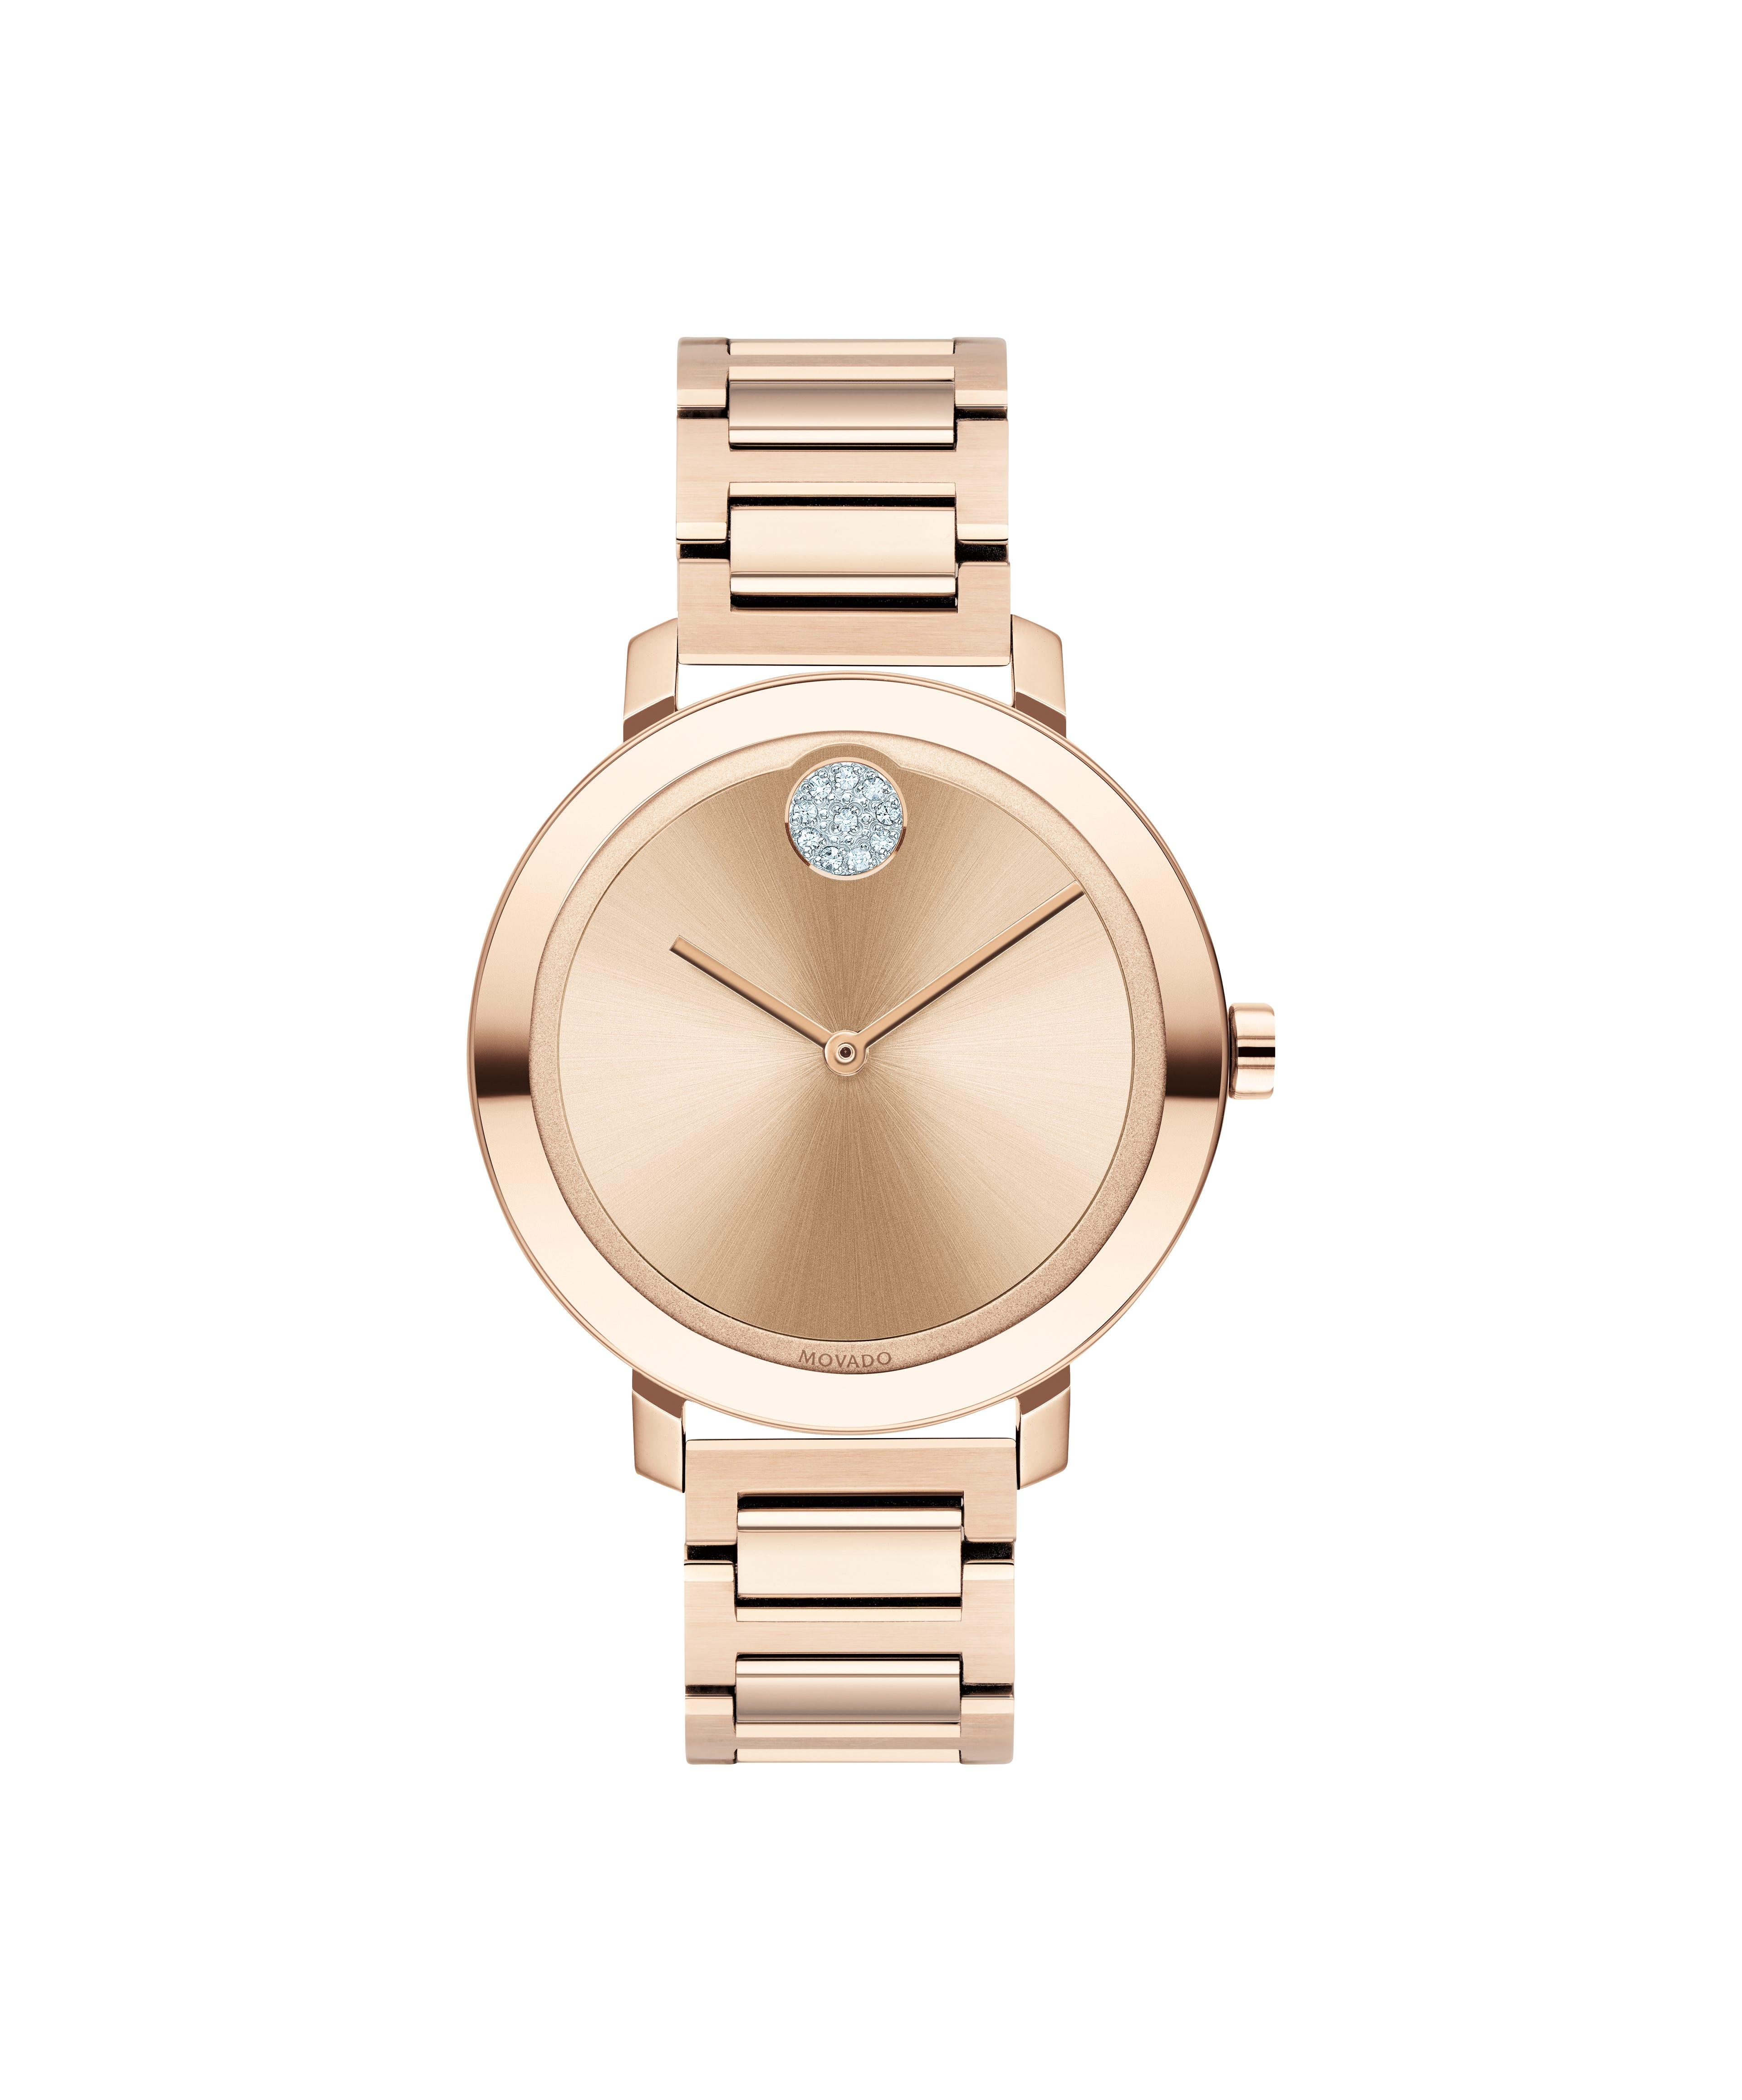 Movado BOLD Ladies' Evolution Watch 3600650